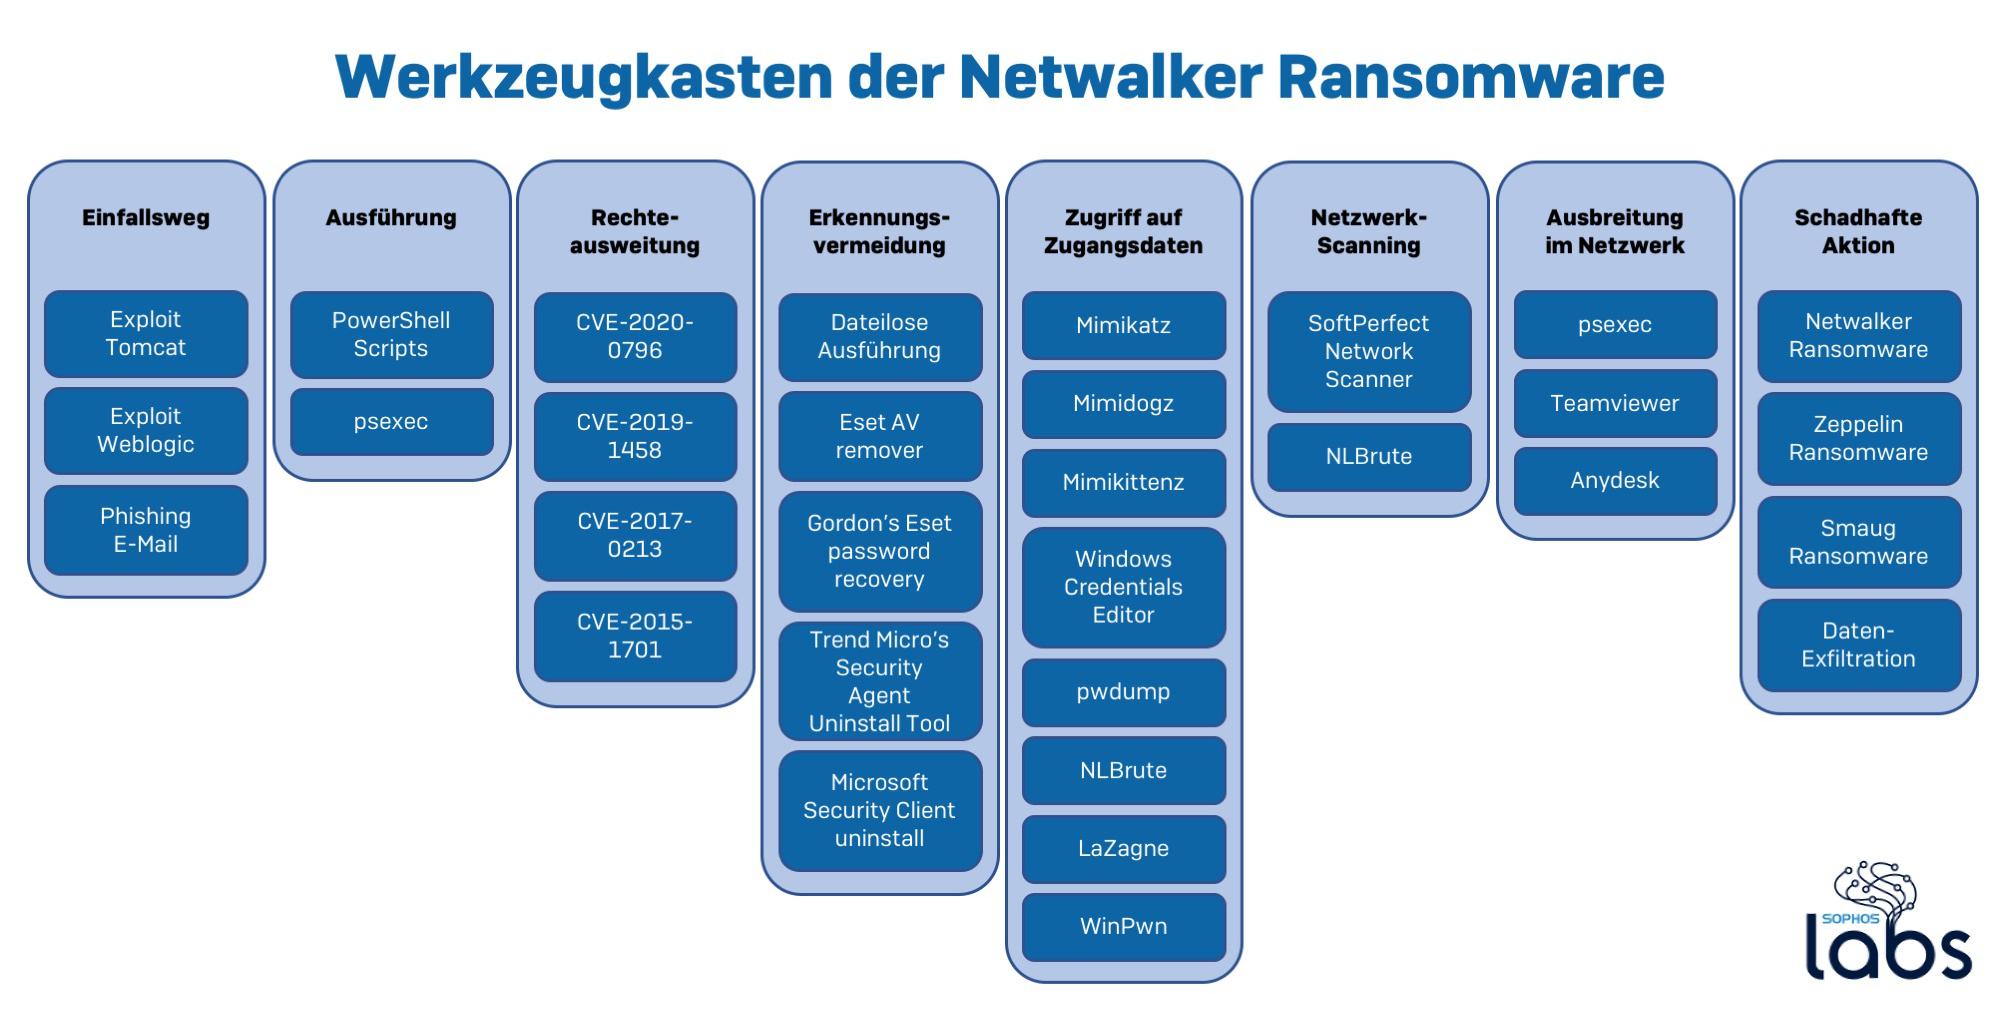 Tiefer Blick in Cybergangsters Werkzeugkasten: Die Methode Netwalker